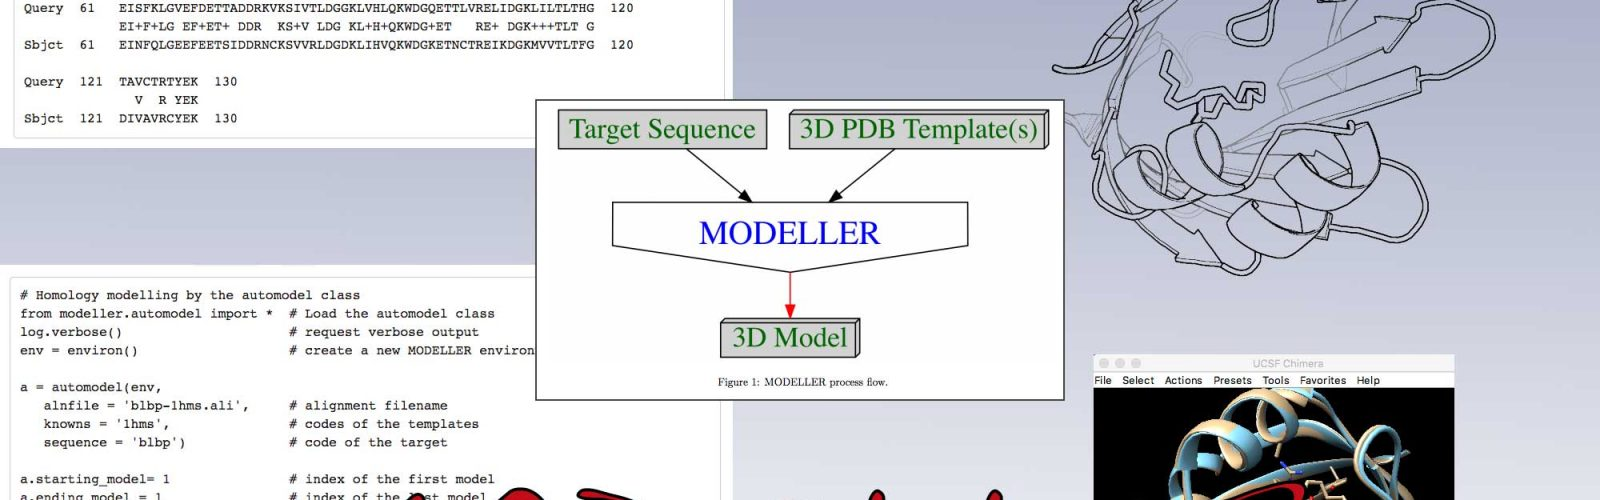 Homology modeling process.